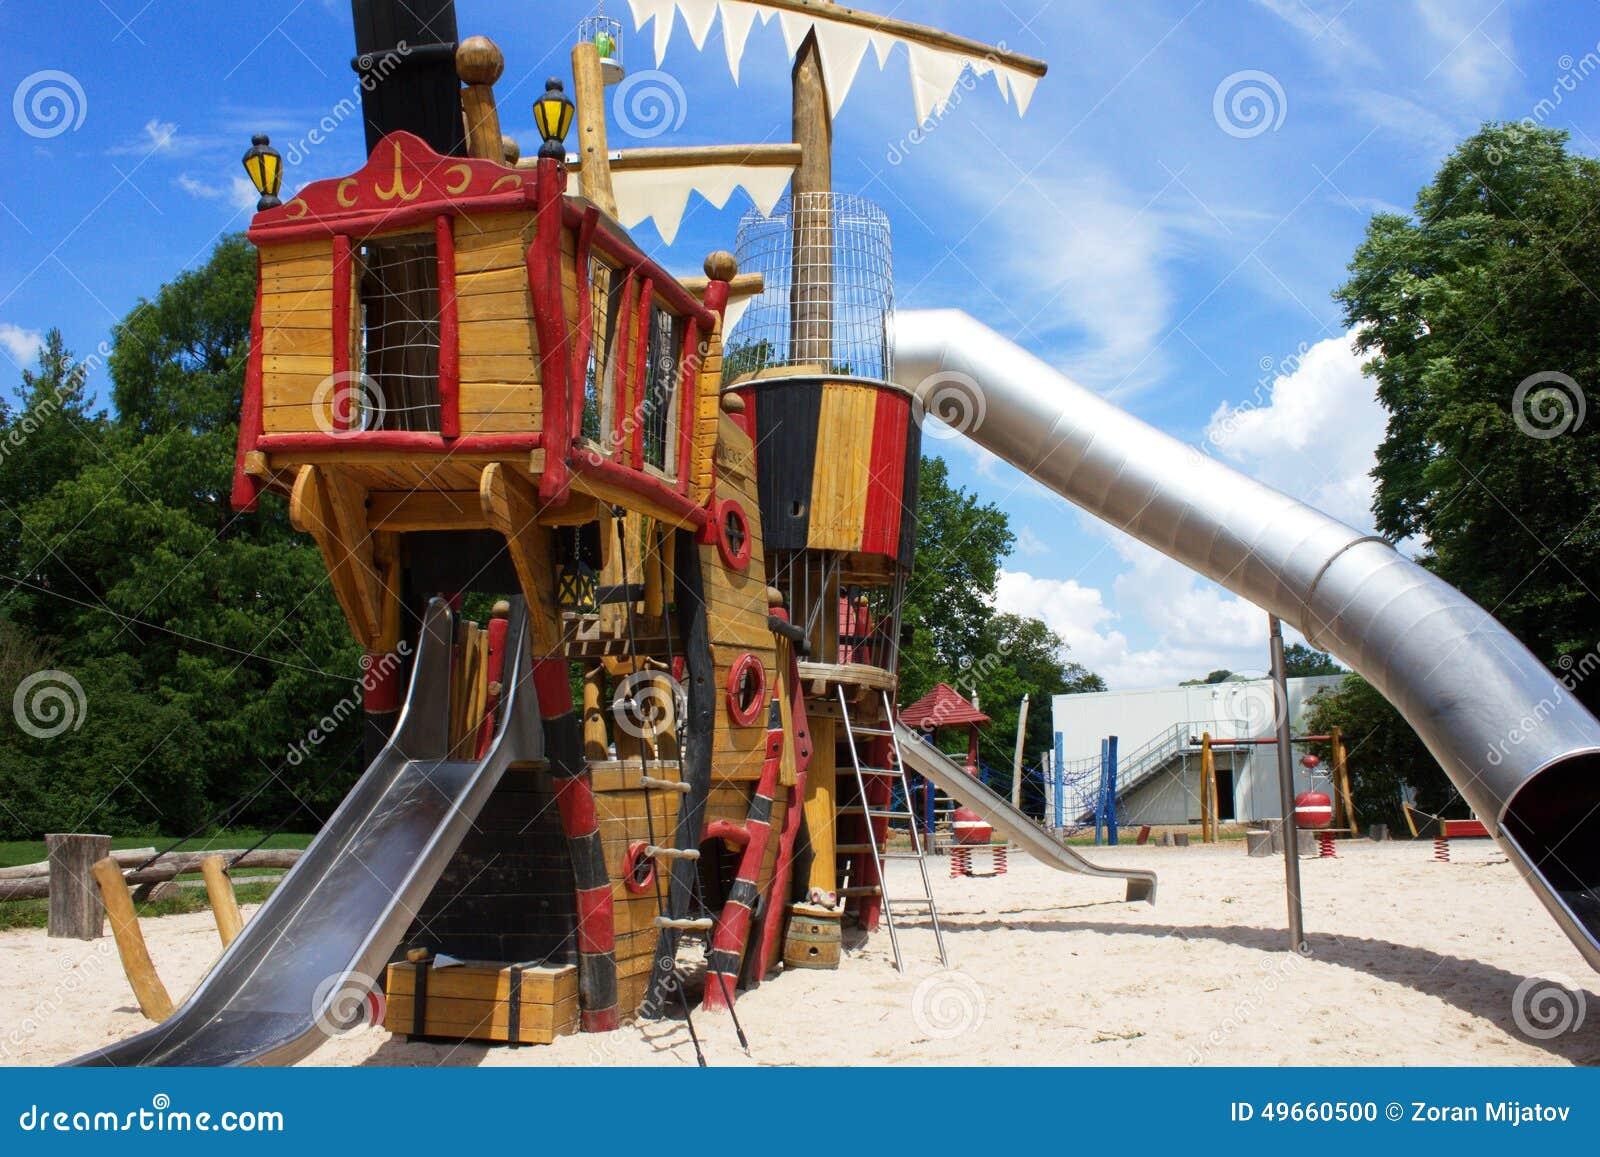 Ship Playground